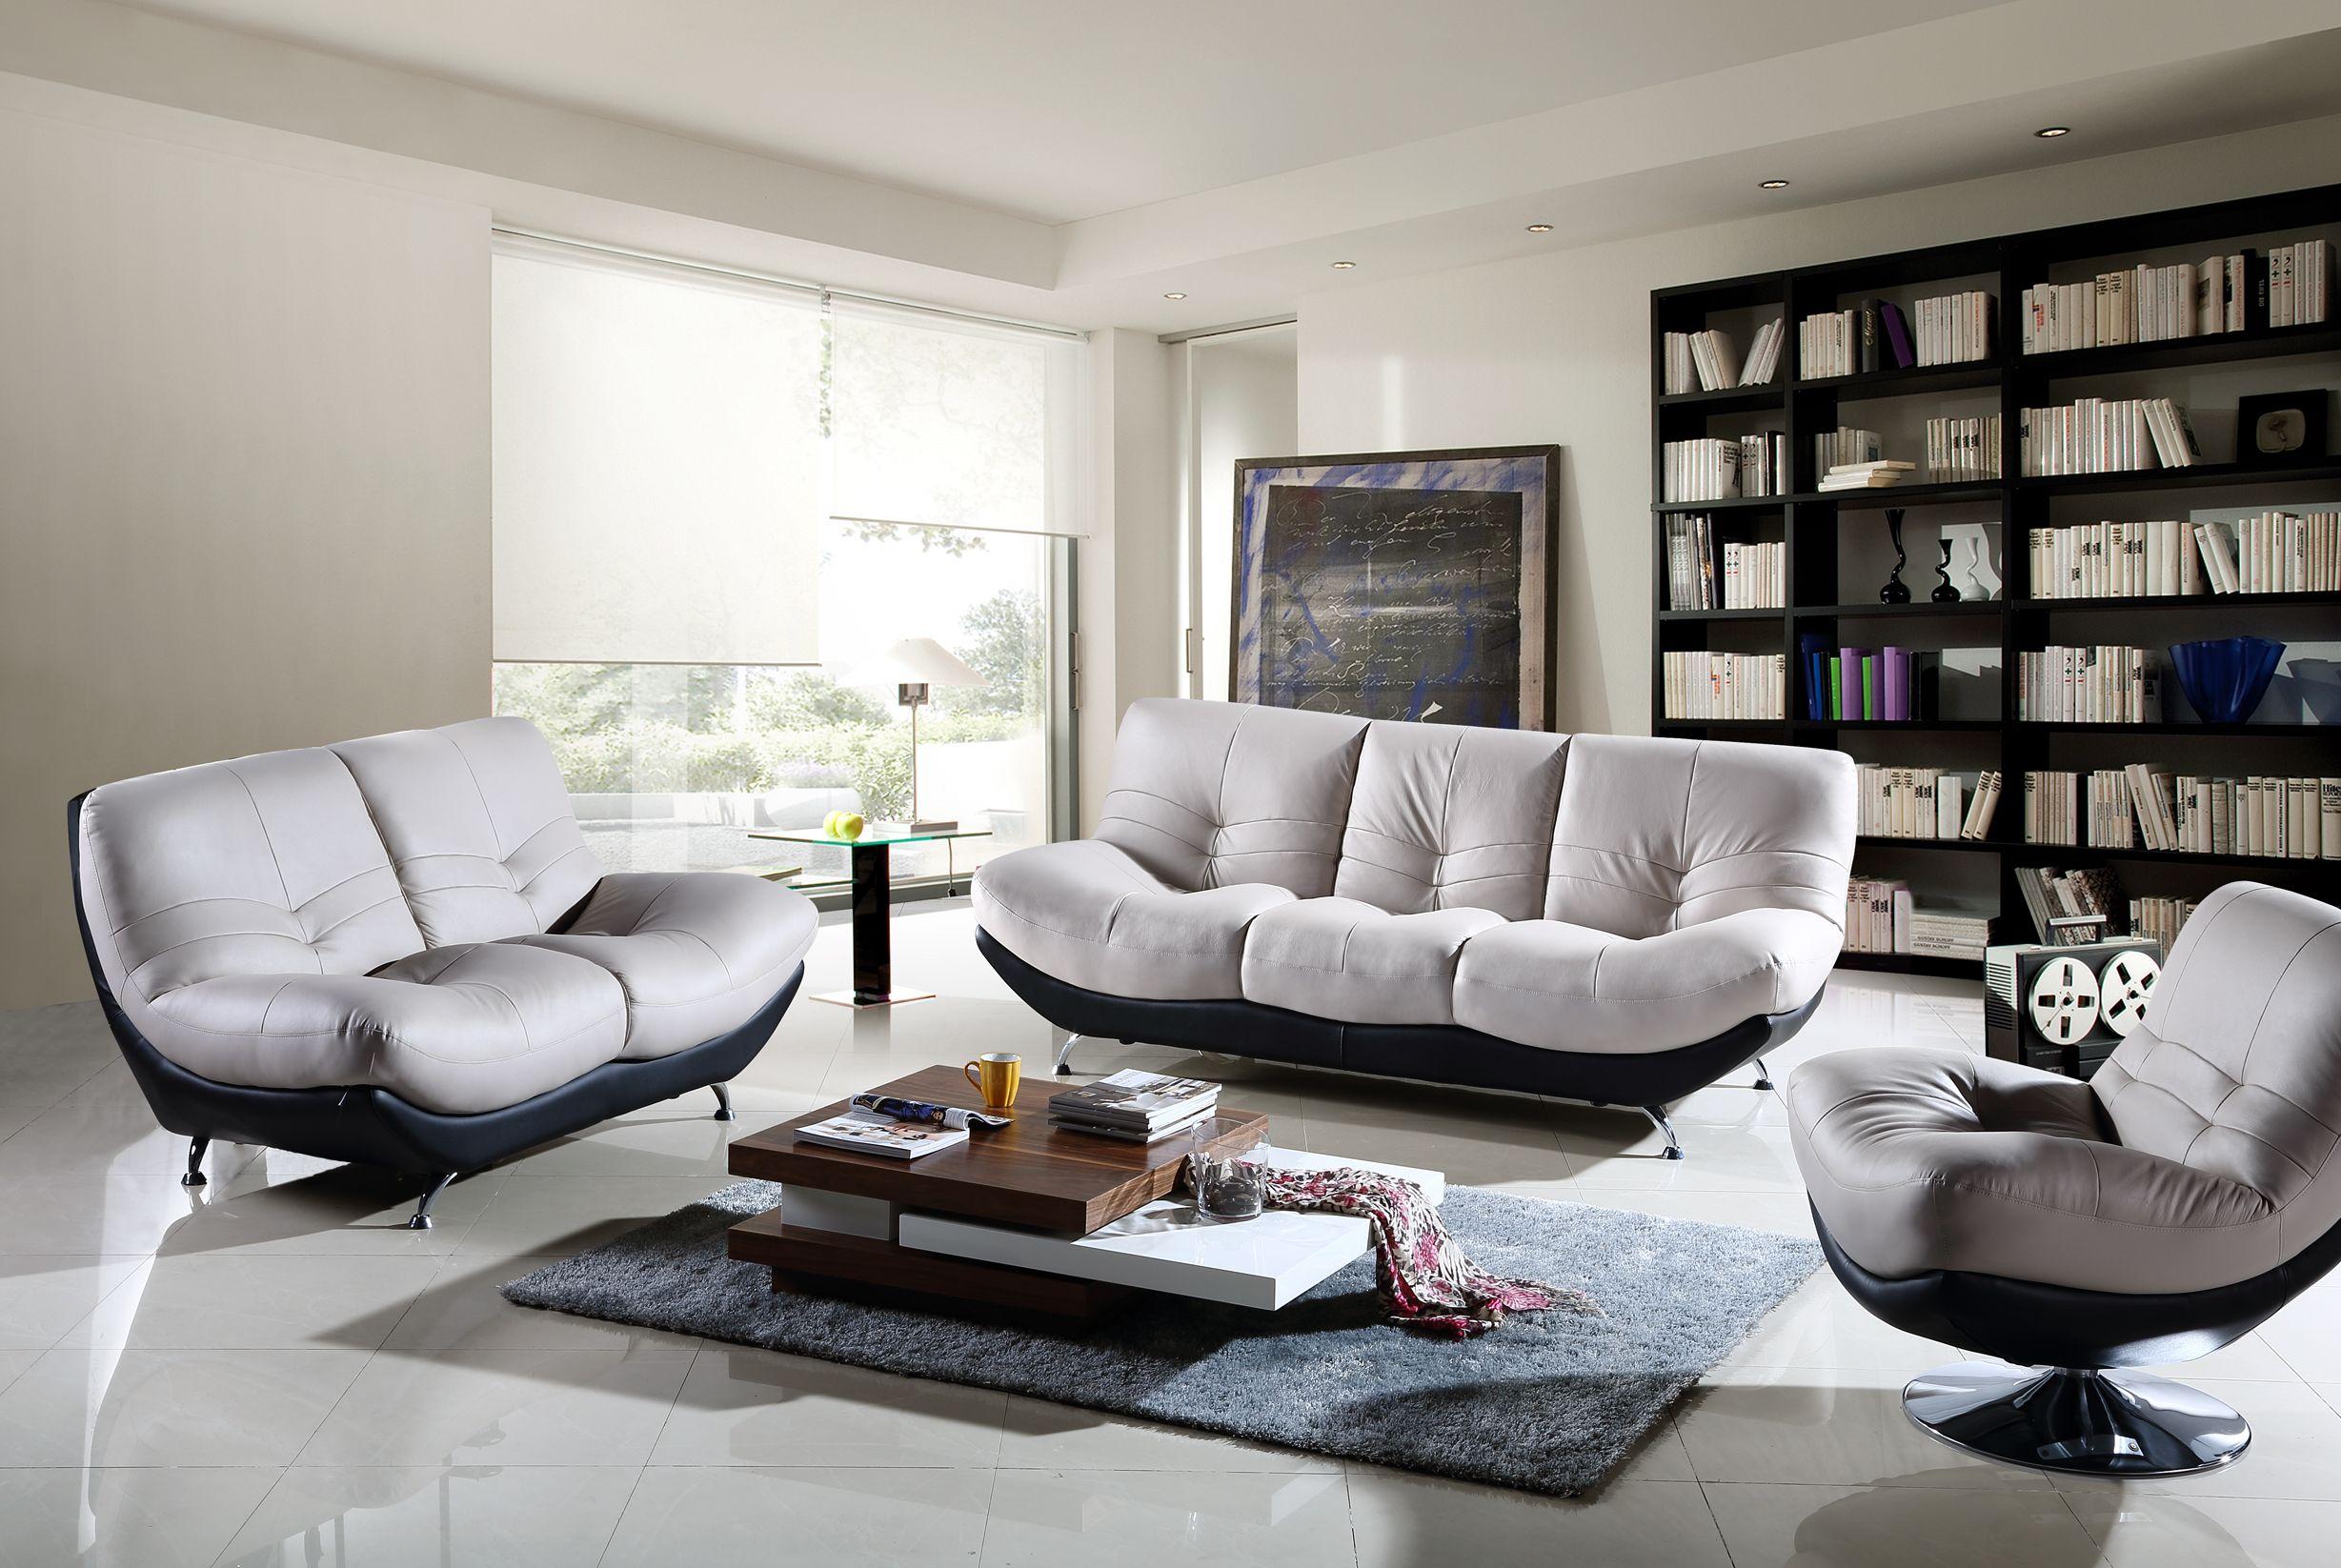 Furniture Modern White Leather 3 Seater Sofa White Leather Loveseat White Leather Swivel Arm Chair Gre Decoration Moderne Idee De Decoration Decoration Maison